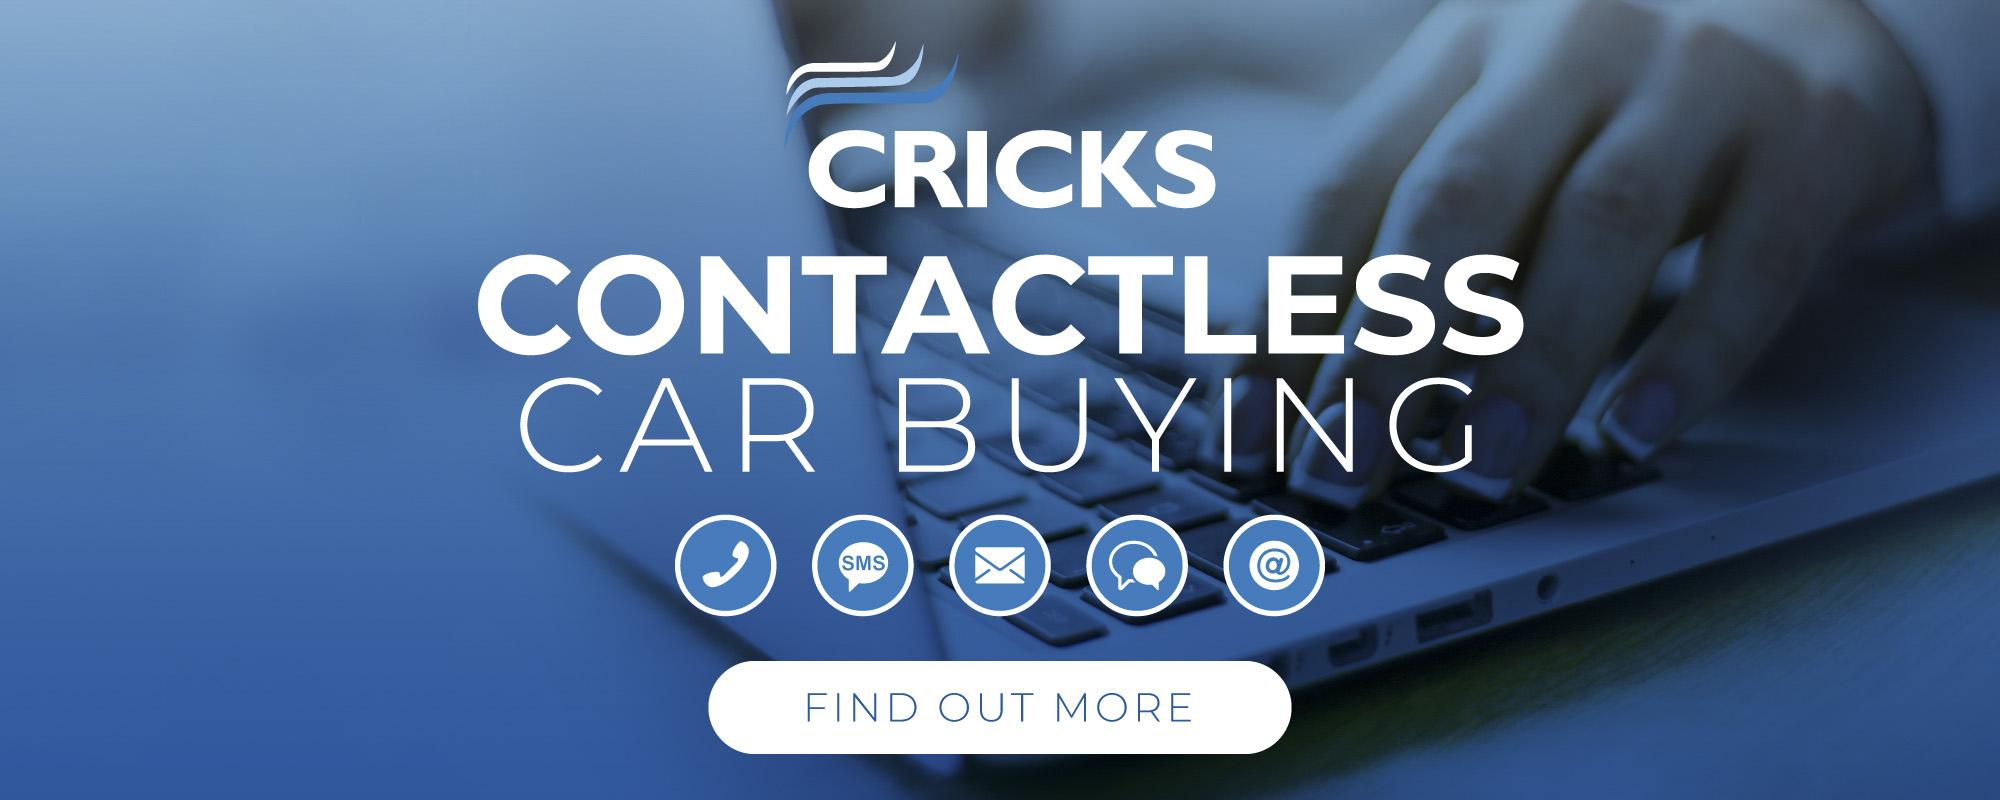 Chwuc Wb Contactless Jun21 2000x800